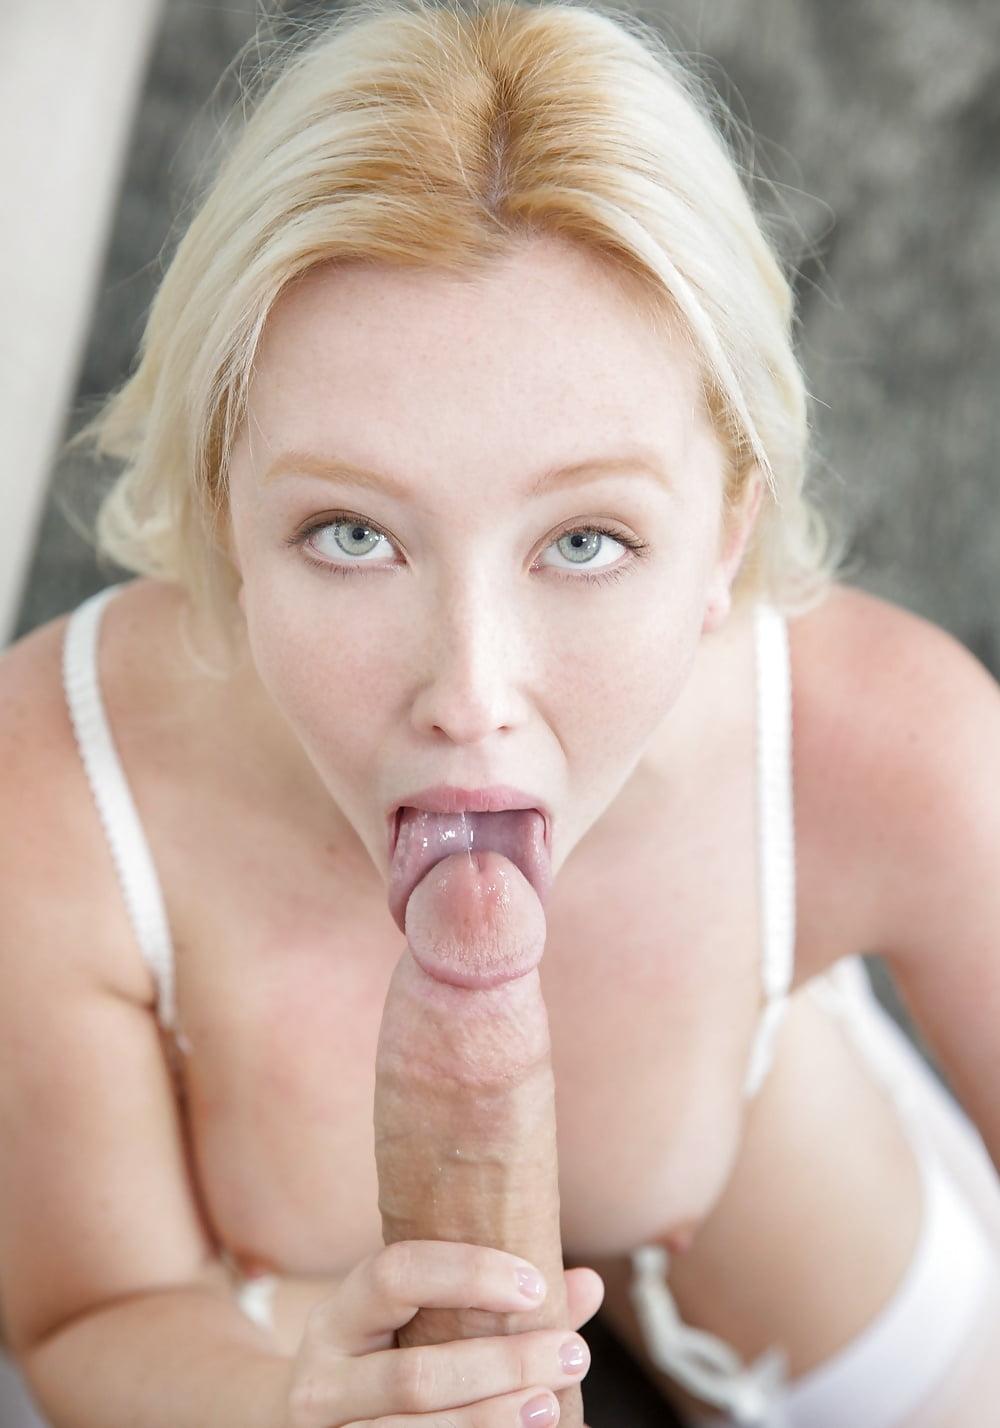 jennys-blowjob-pics-xxx-nude